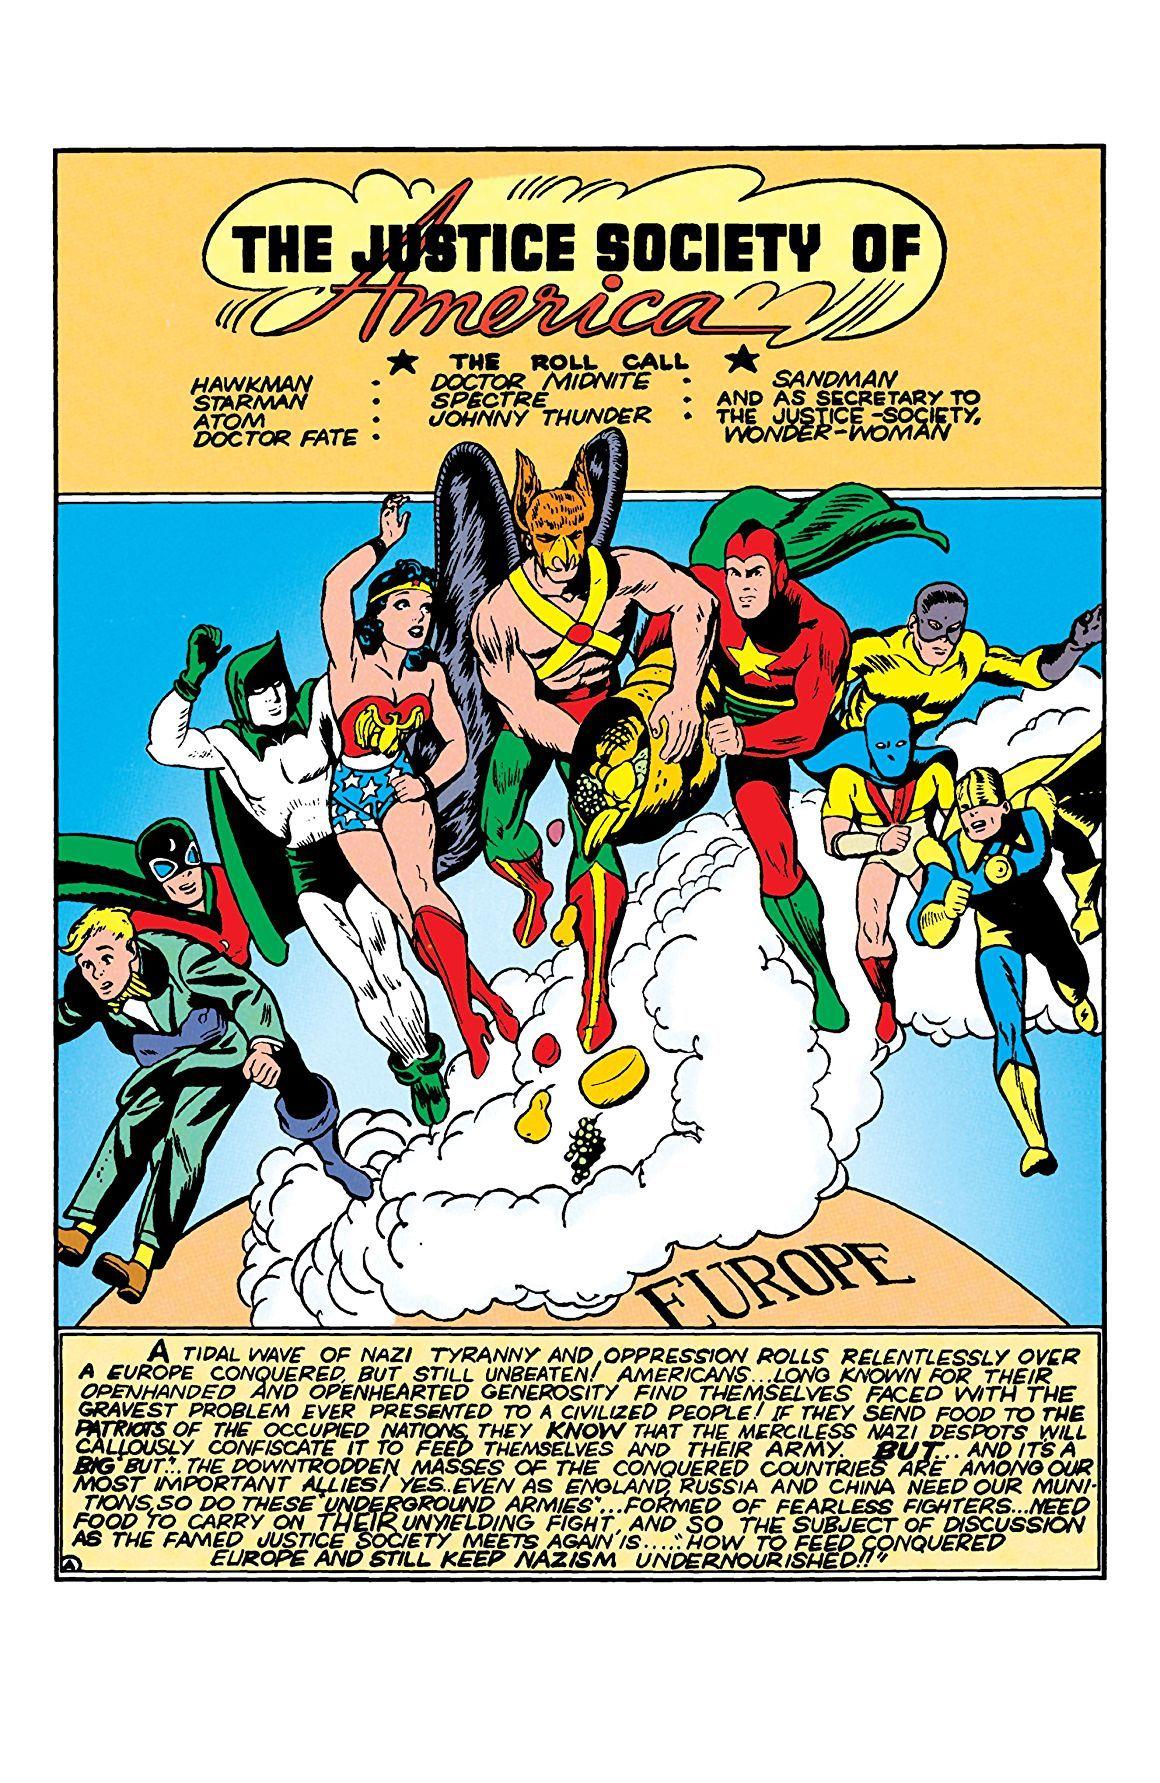 All Star Comics 14 Comics By Comixology Star Comics Comics Justice Society Of America